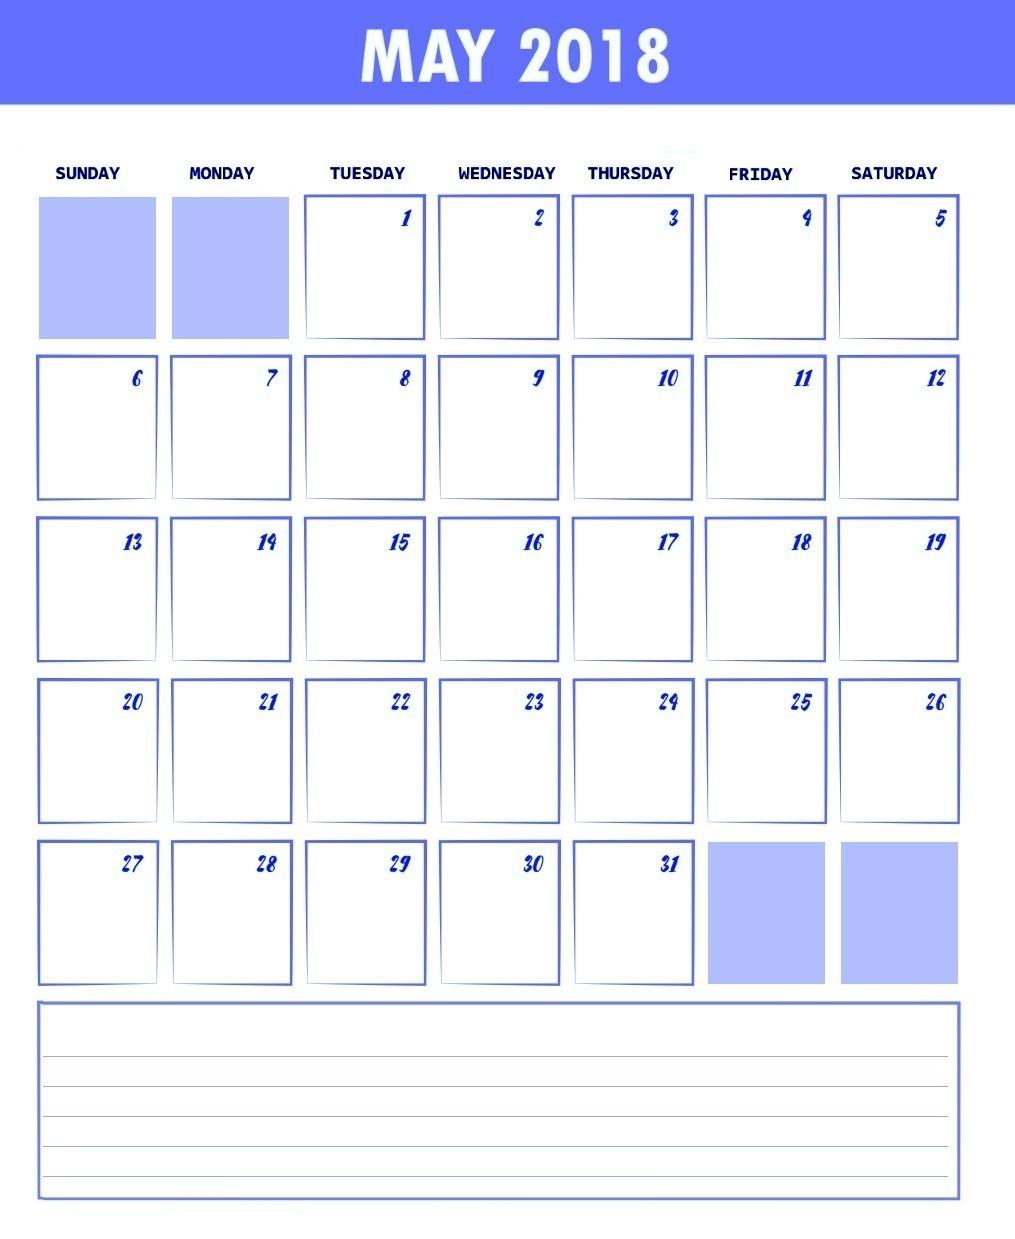 Waterproofpapercom January 2018 | Thekpark-Hadong-Waterproofpaper.com January 2020 Calendar